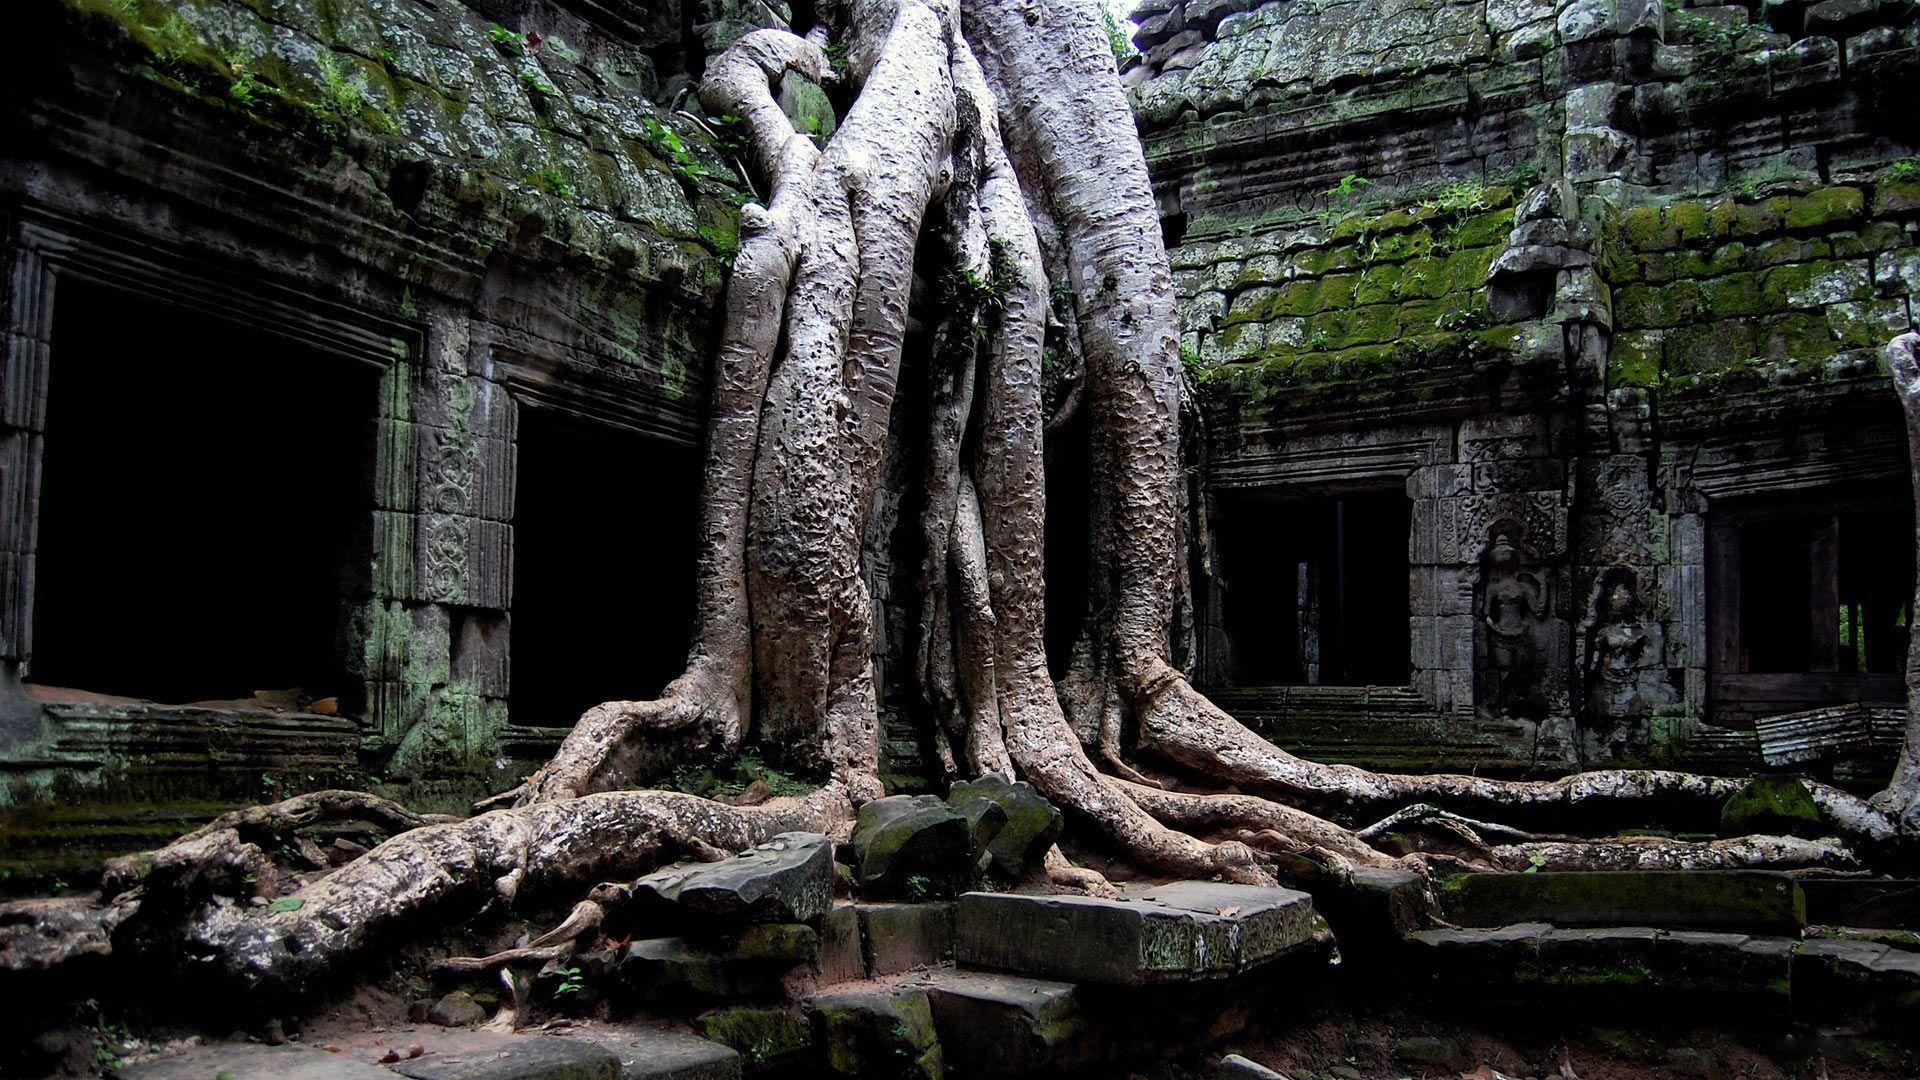 Desktop Wallpaper · Gallery · Nature · Temple Buddha | Free ...